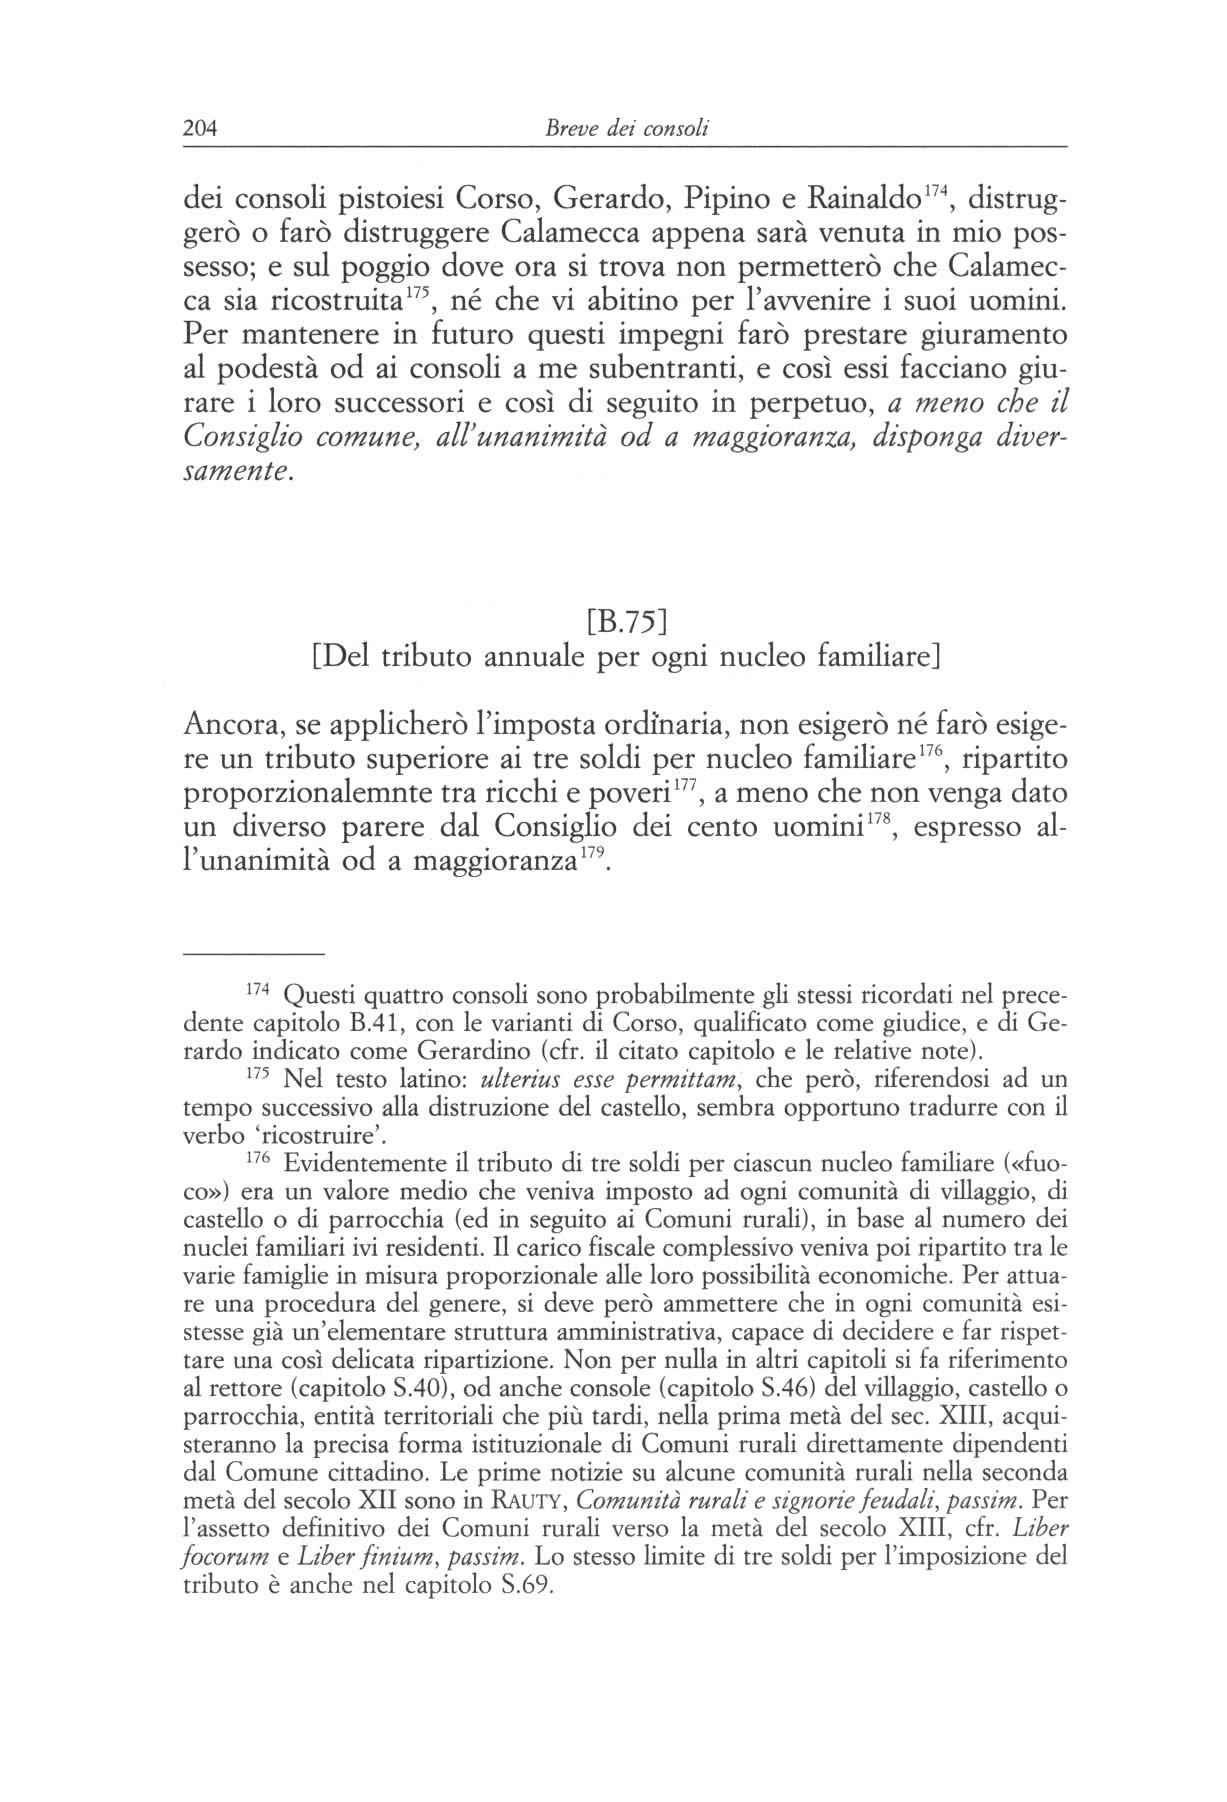 statuti pistoiesi del sec.XII 0204.jpg